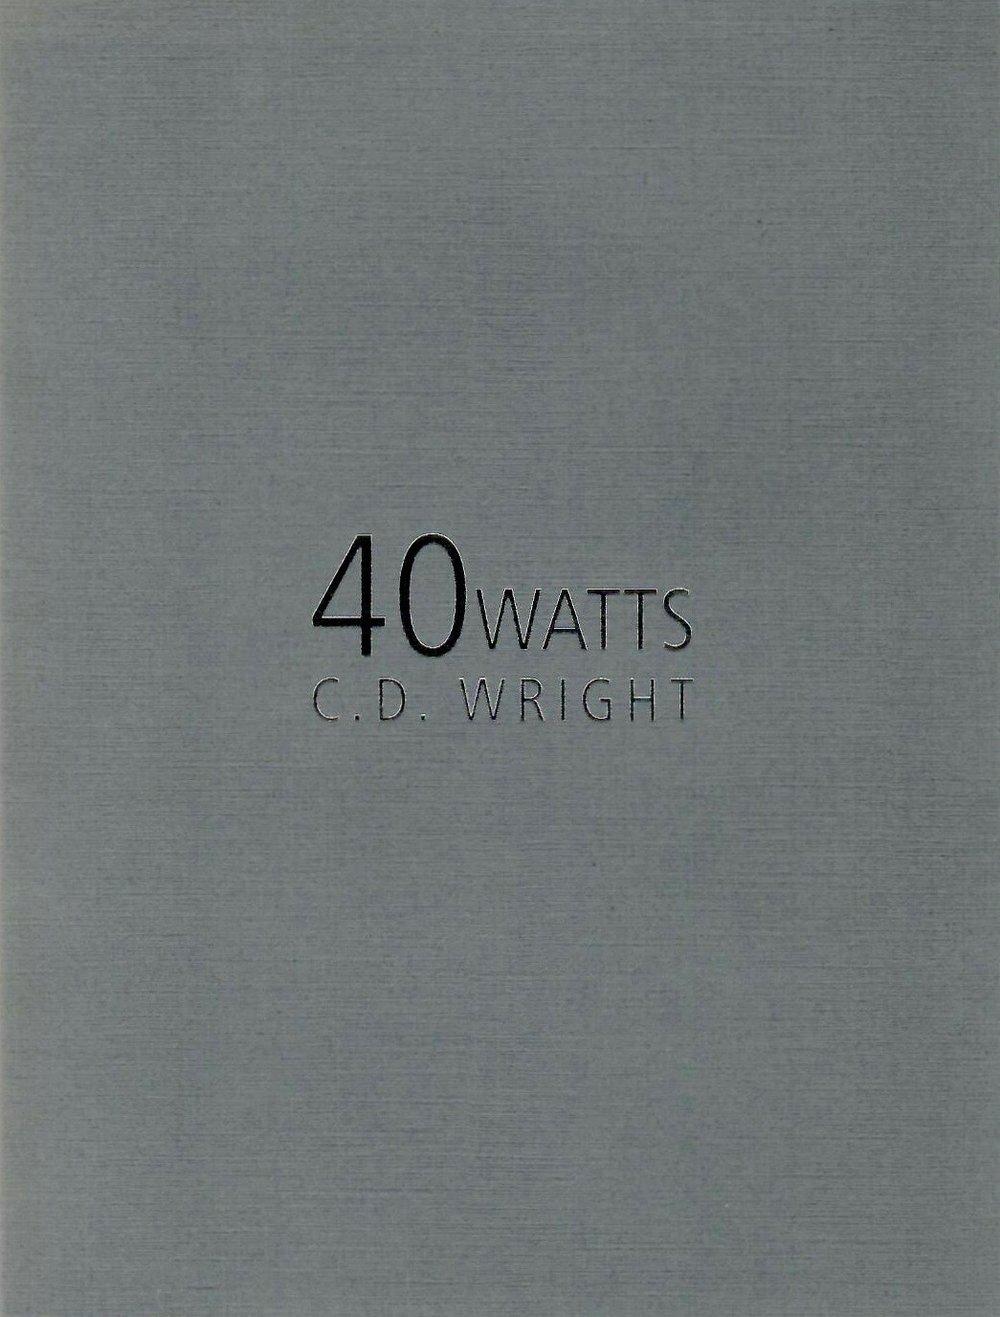 40_watts.jpg